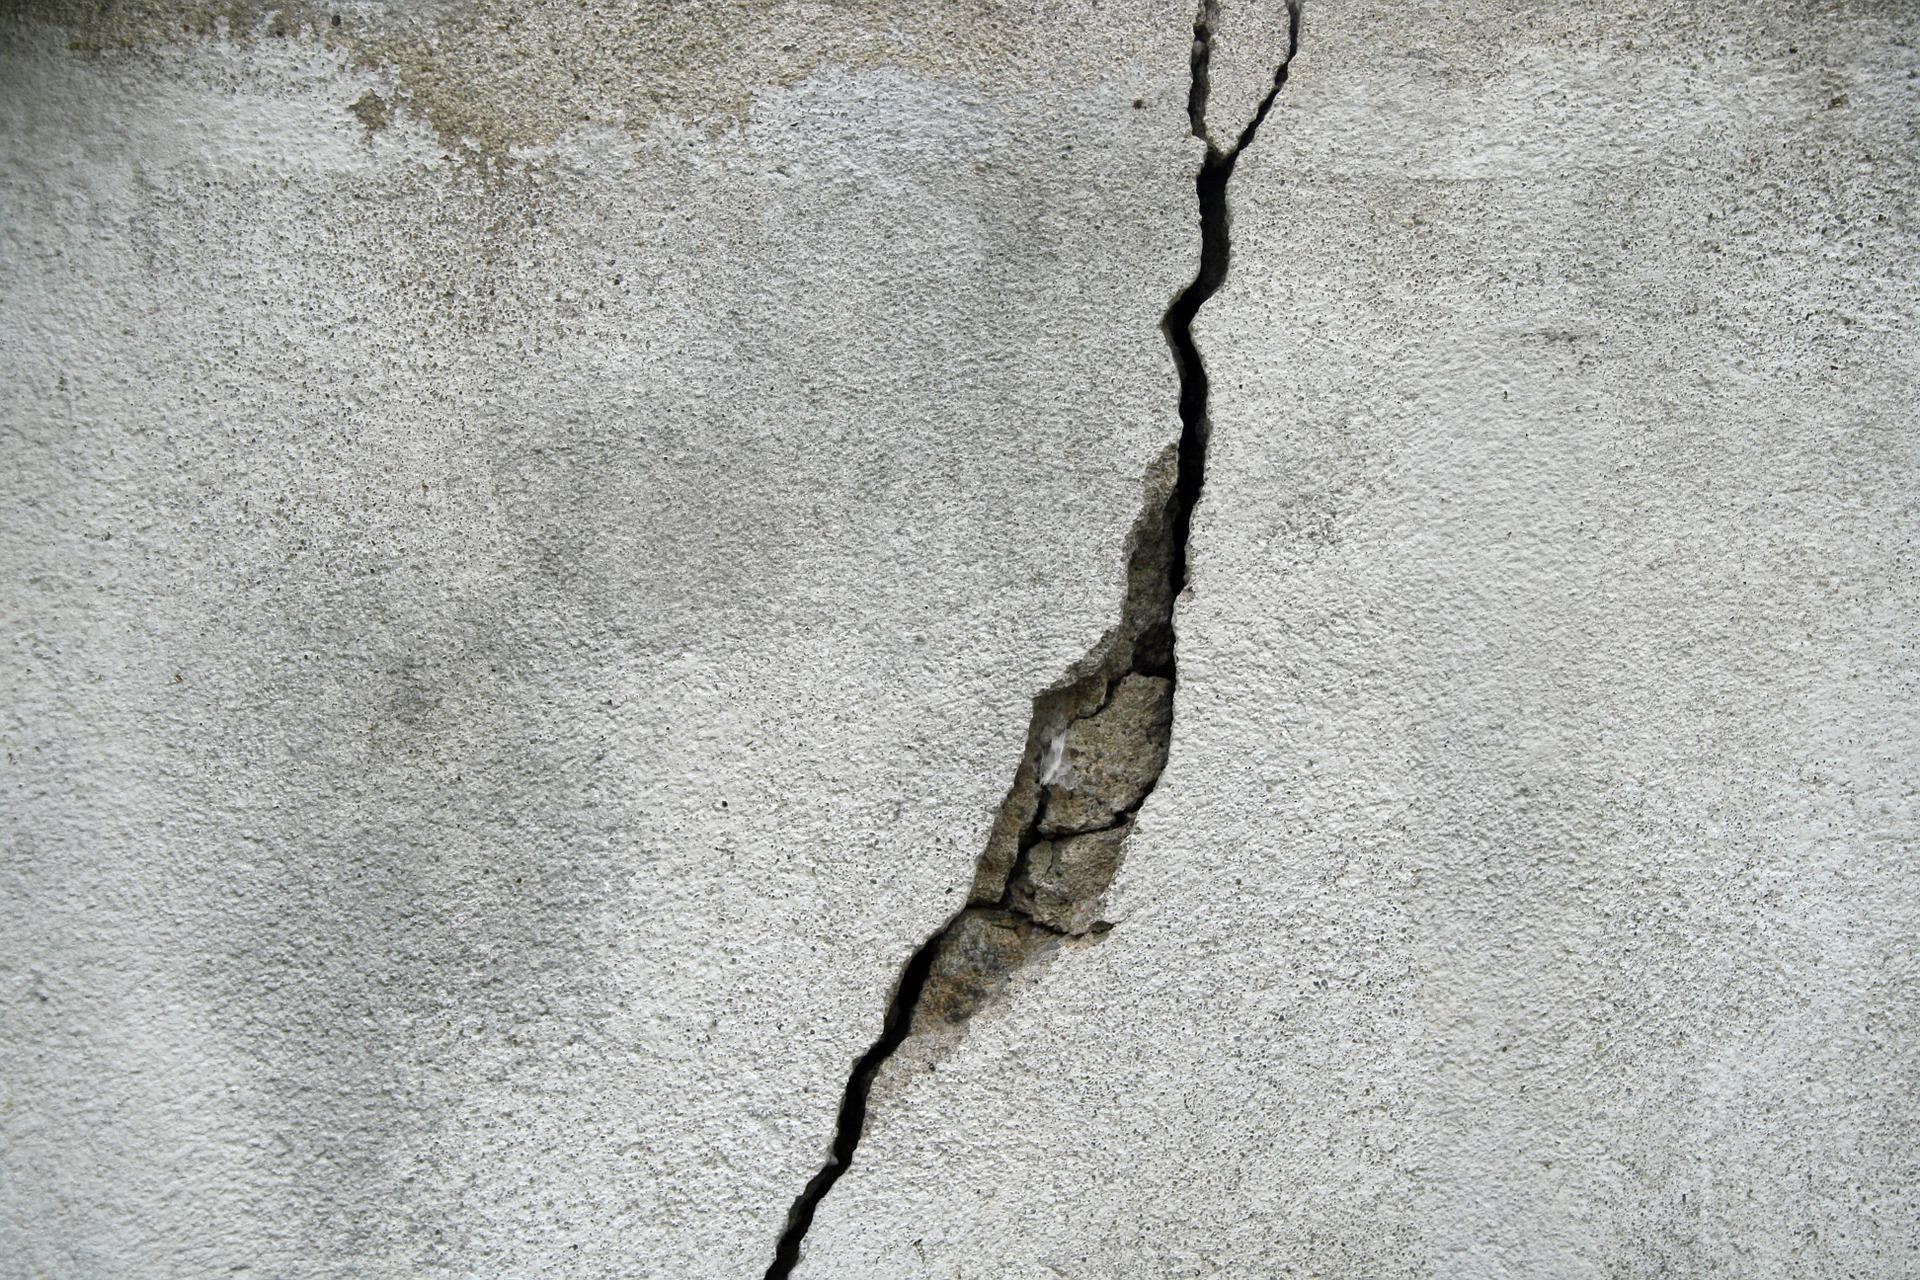 crack-695010_1920.jpg